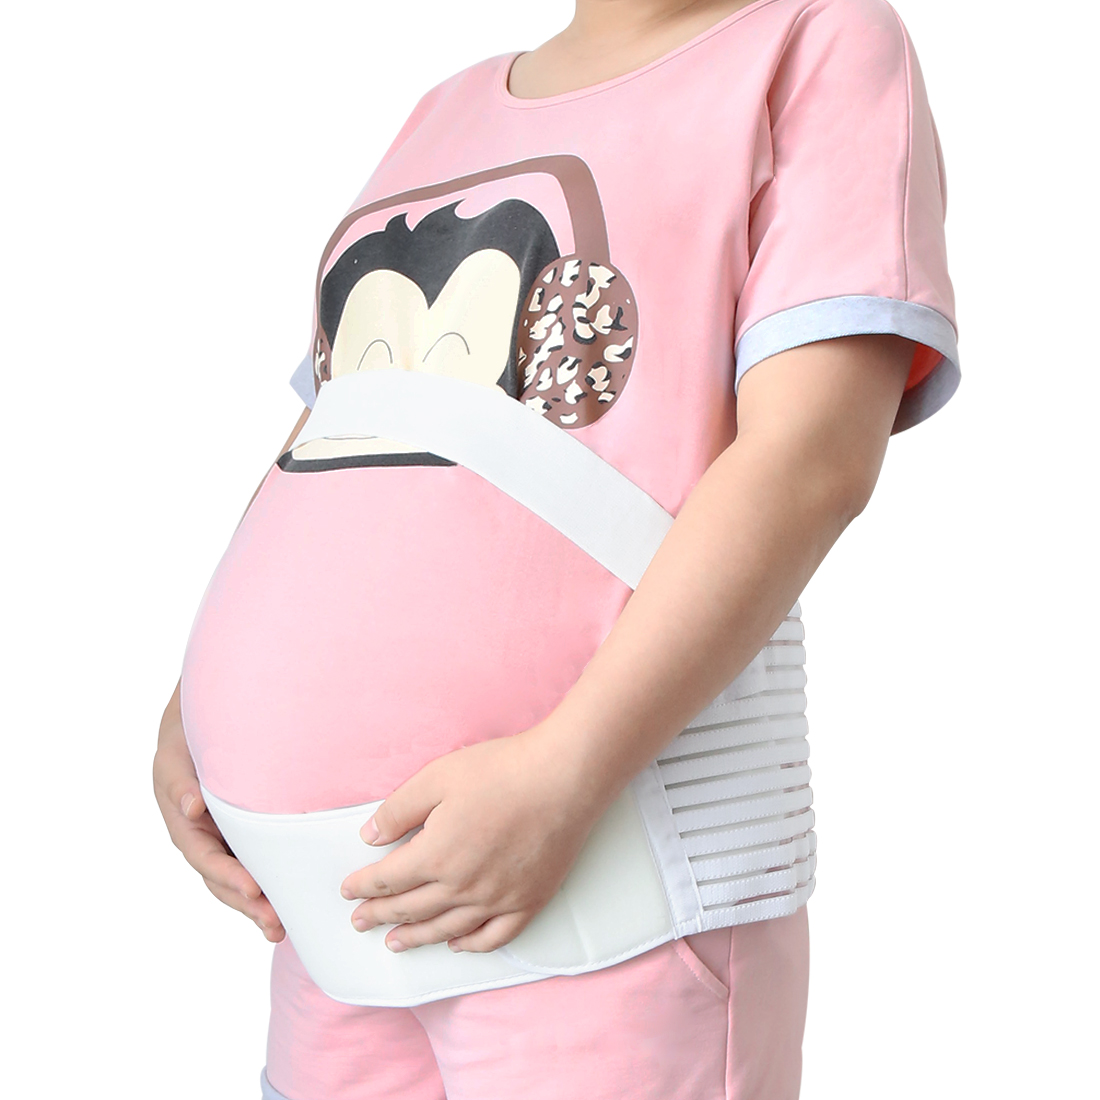 Tasharina M White Pregnancy Maternity Support Belt Waist Back Abdomen Belly Brace Band